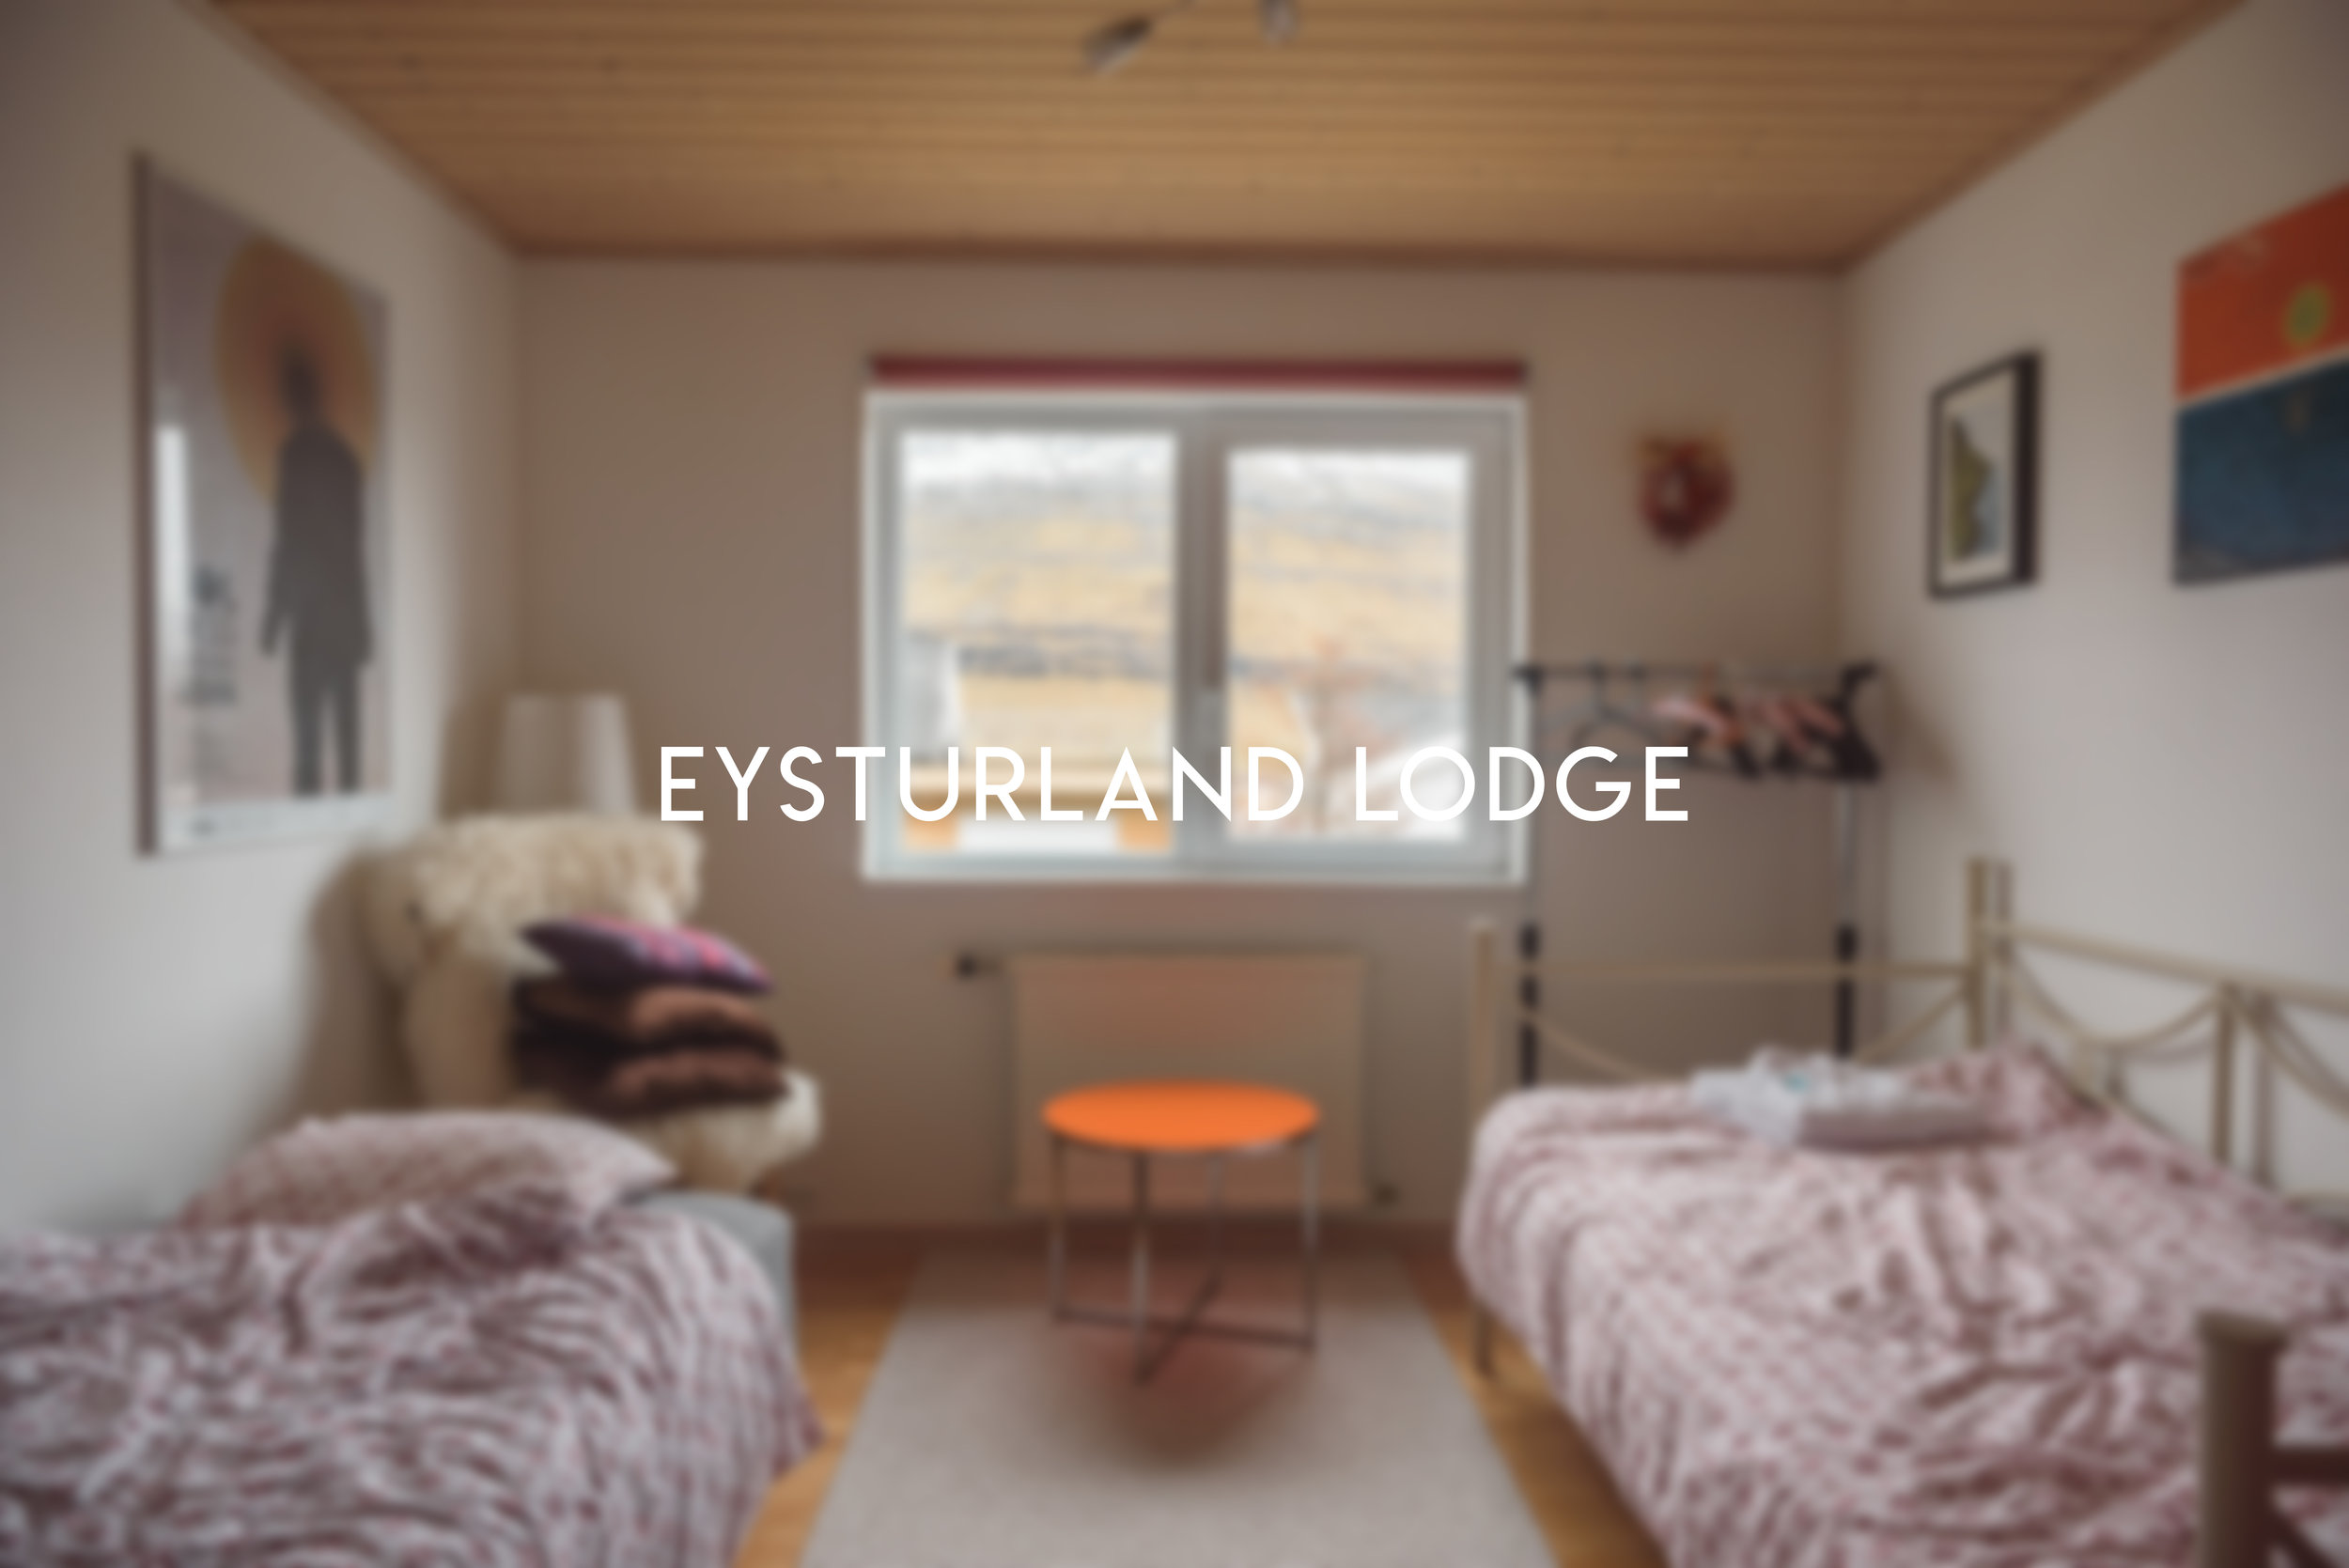 Eysturland Lodge Cover Photo.jpg